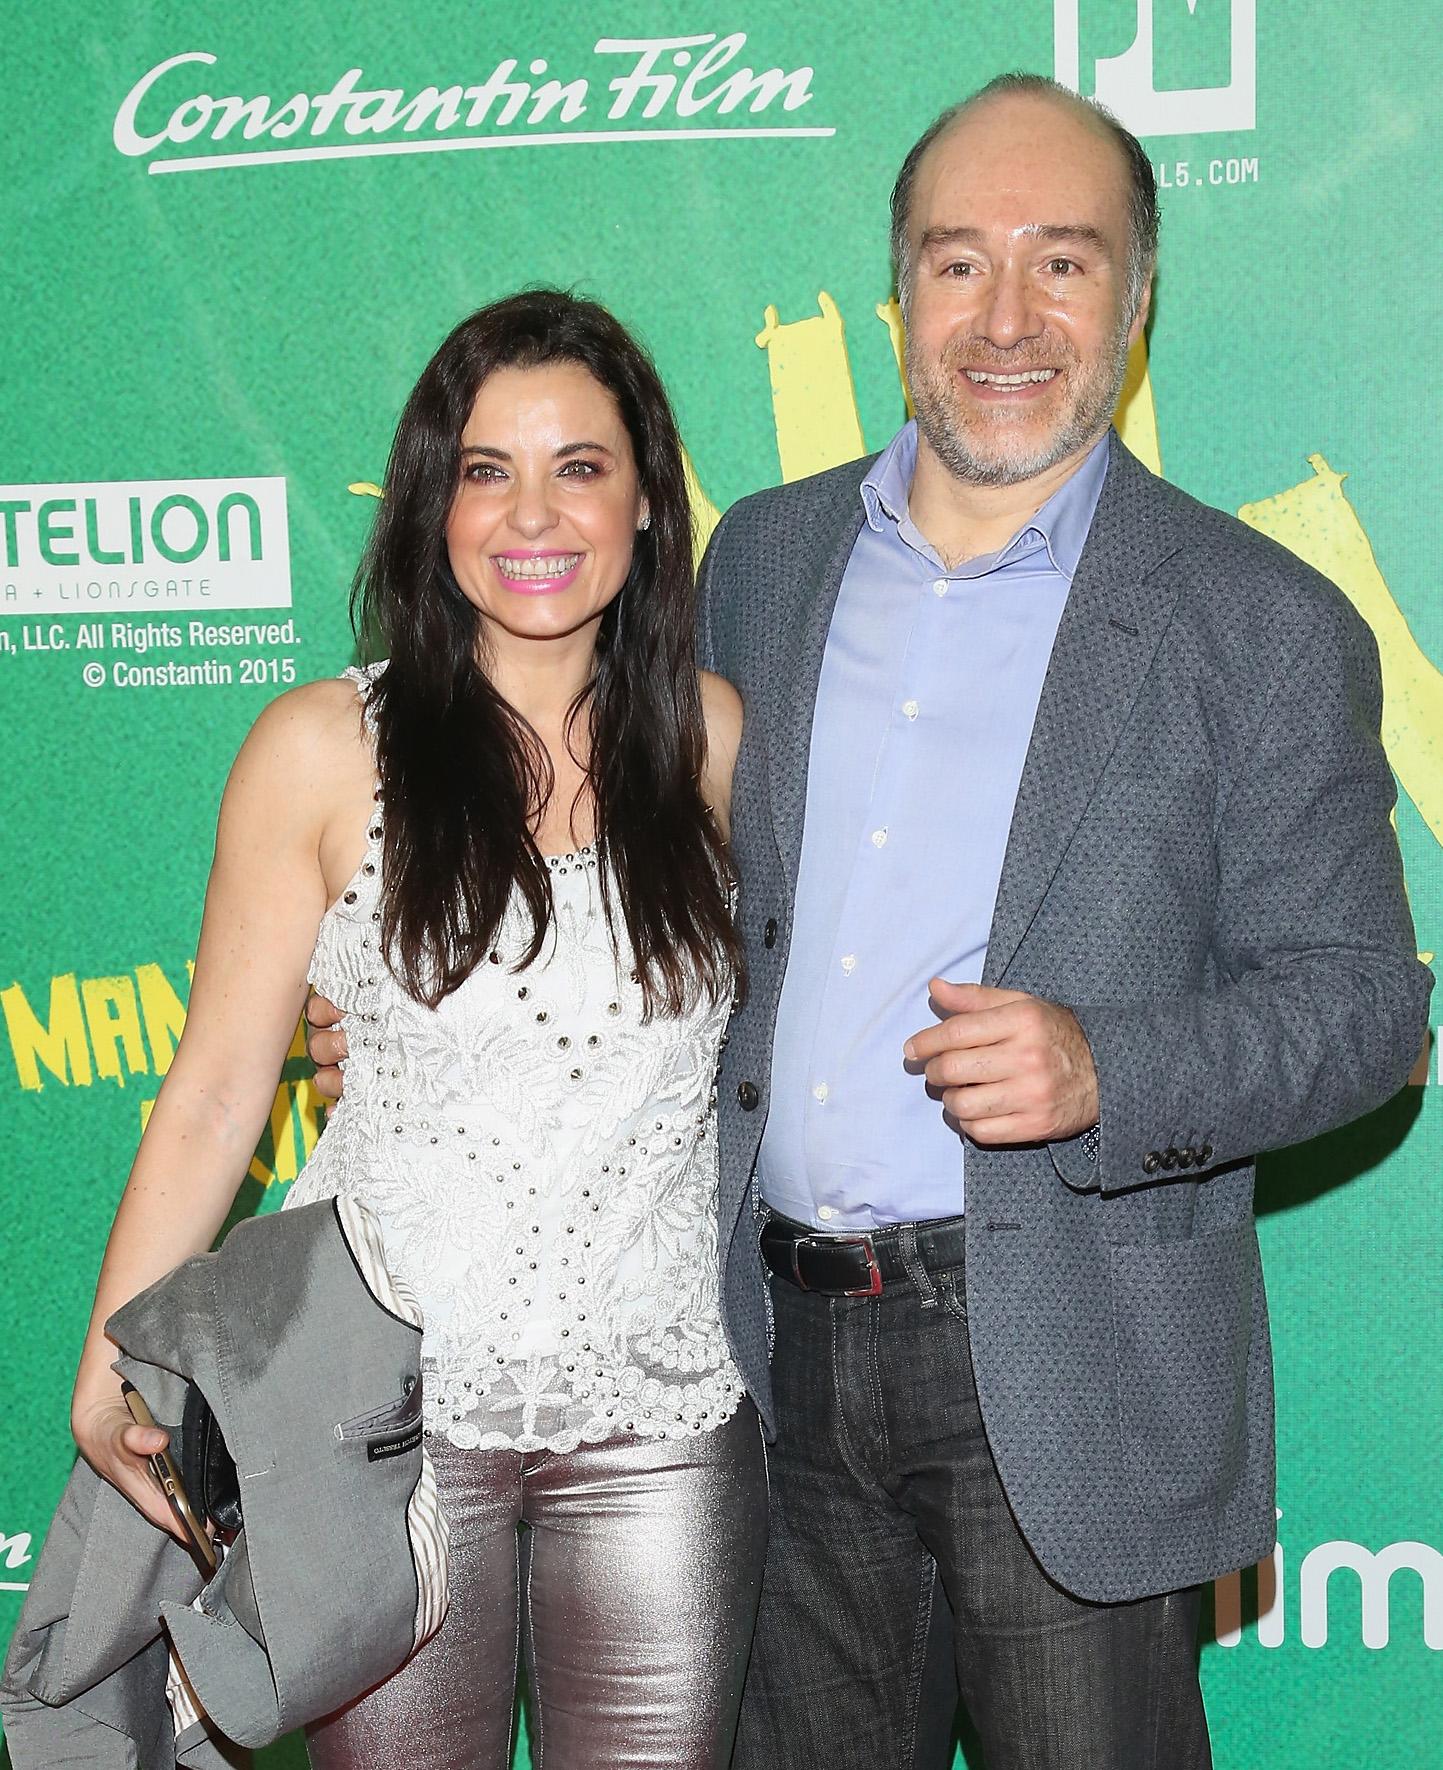 Yolanda Ventura and Odiseo Bichir